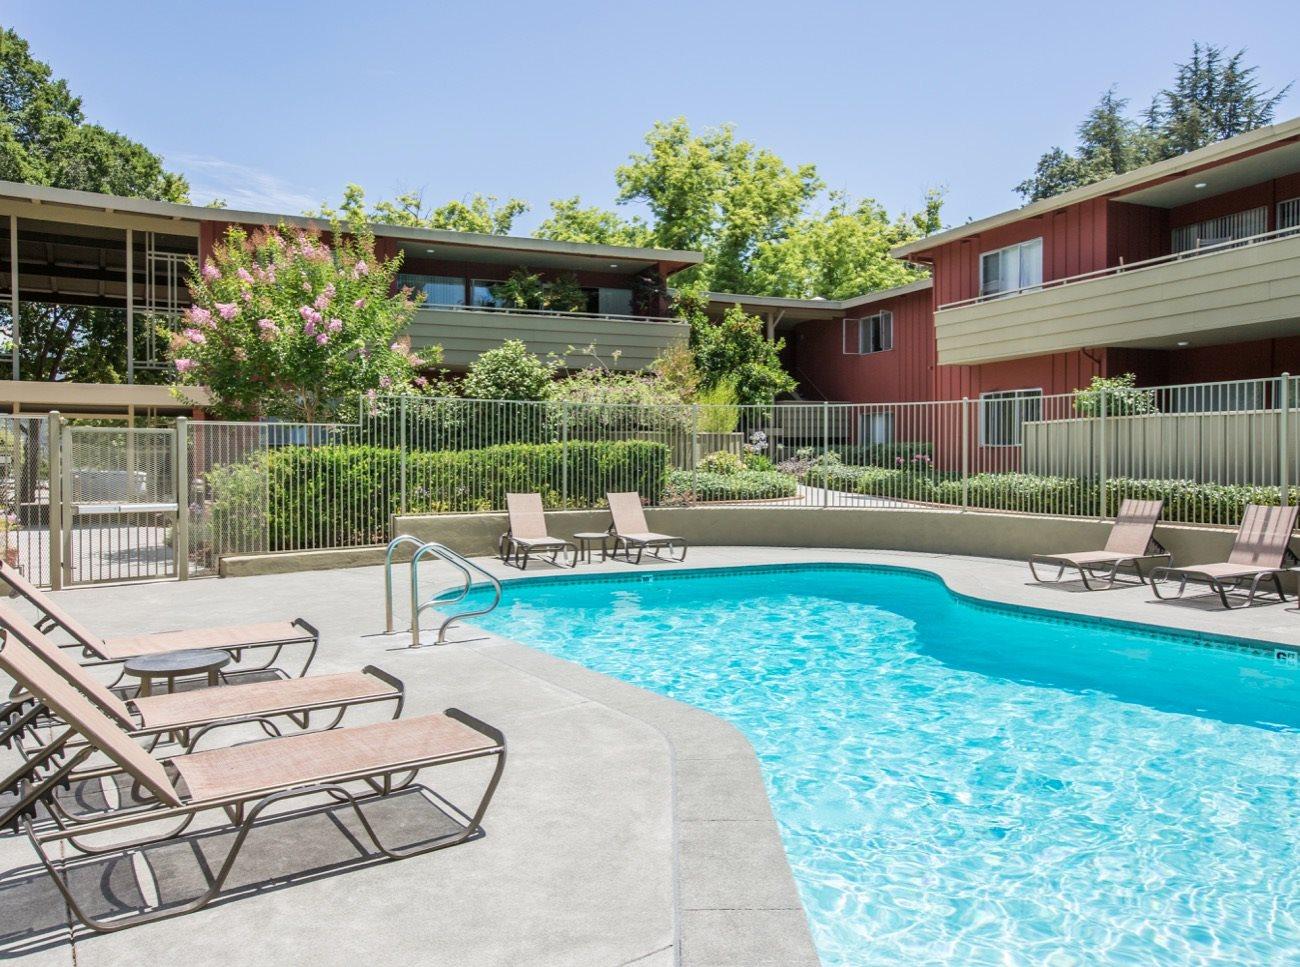 bay-tree-los-gatos-apartments-relaxing-pool